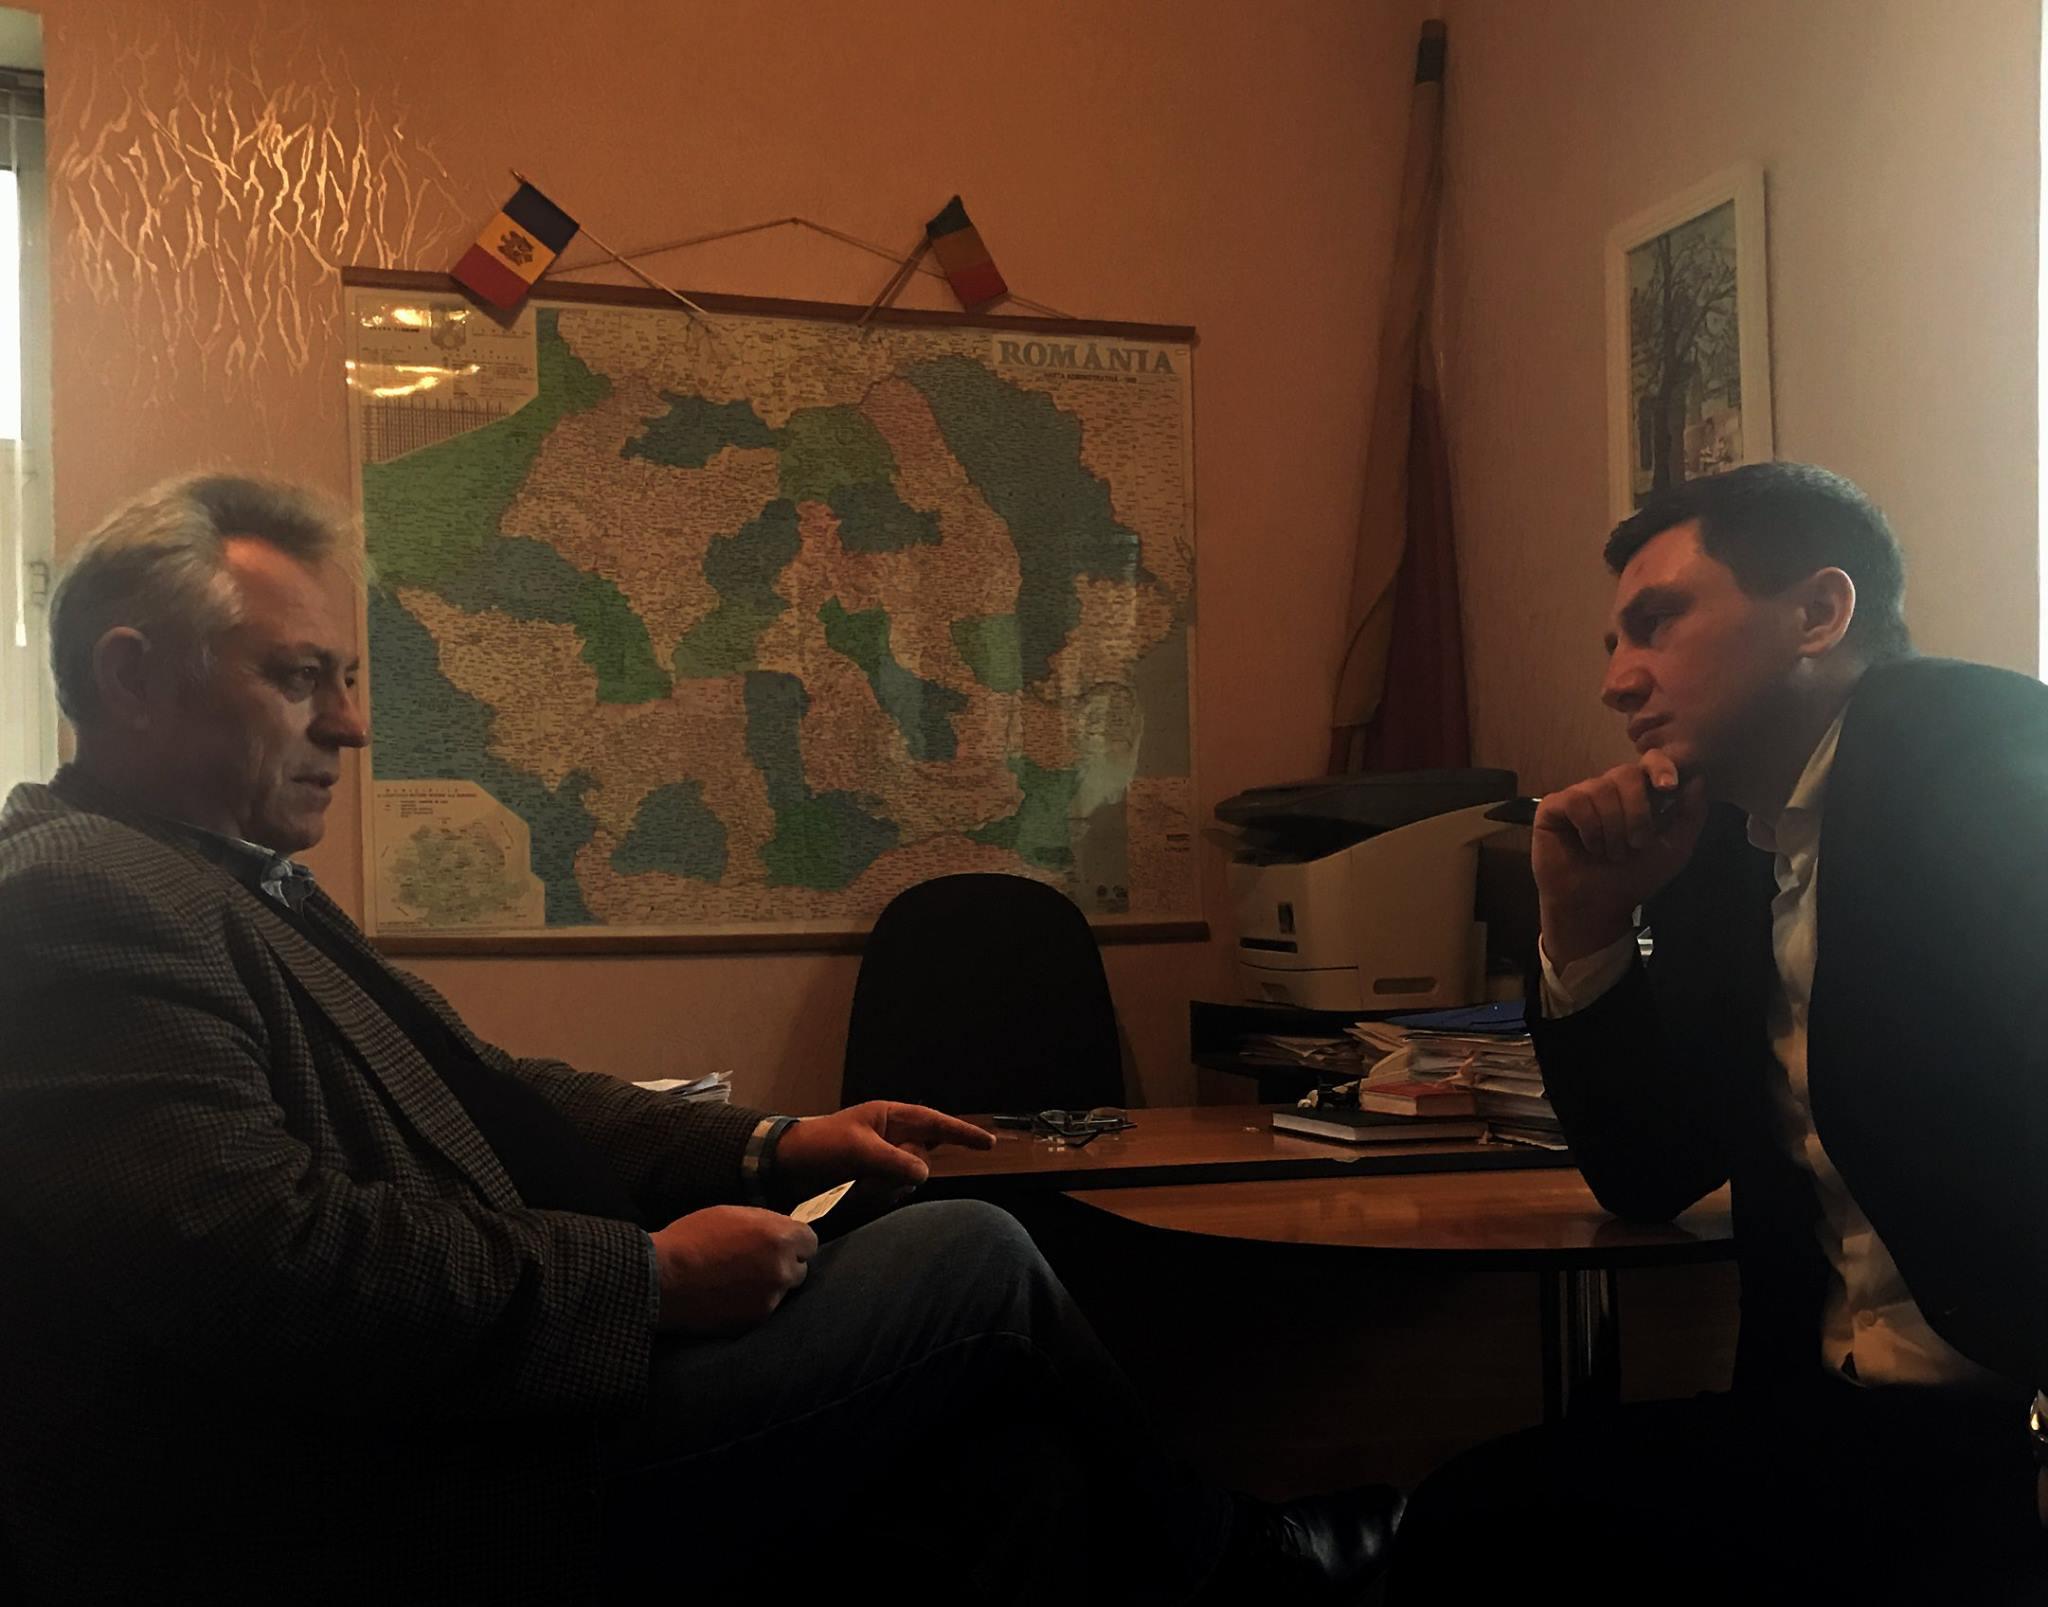 Constantin Codreanu Casa Limbii Romane Alexandru Bantos